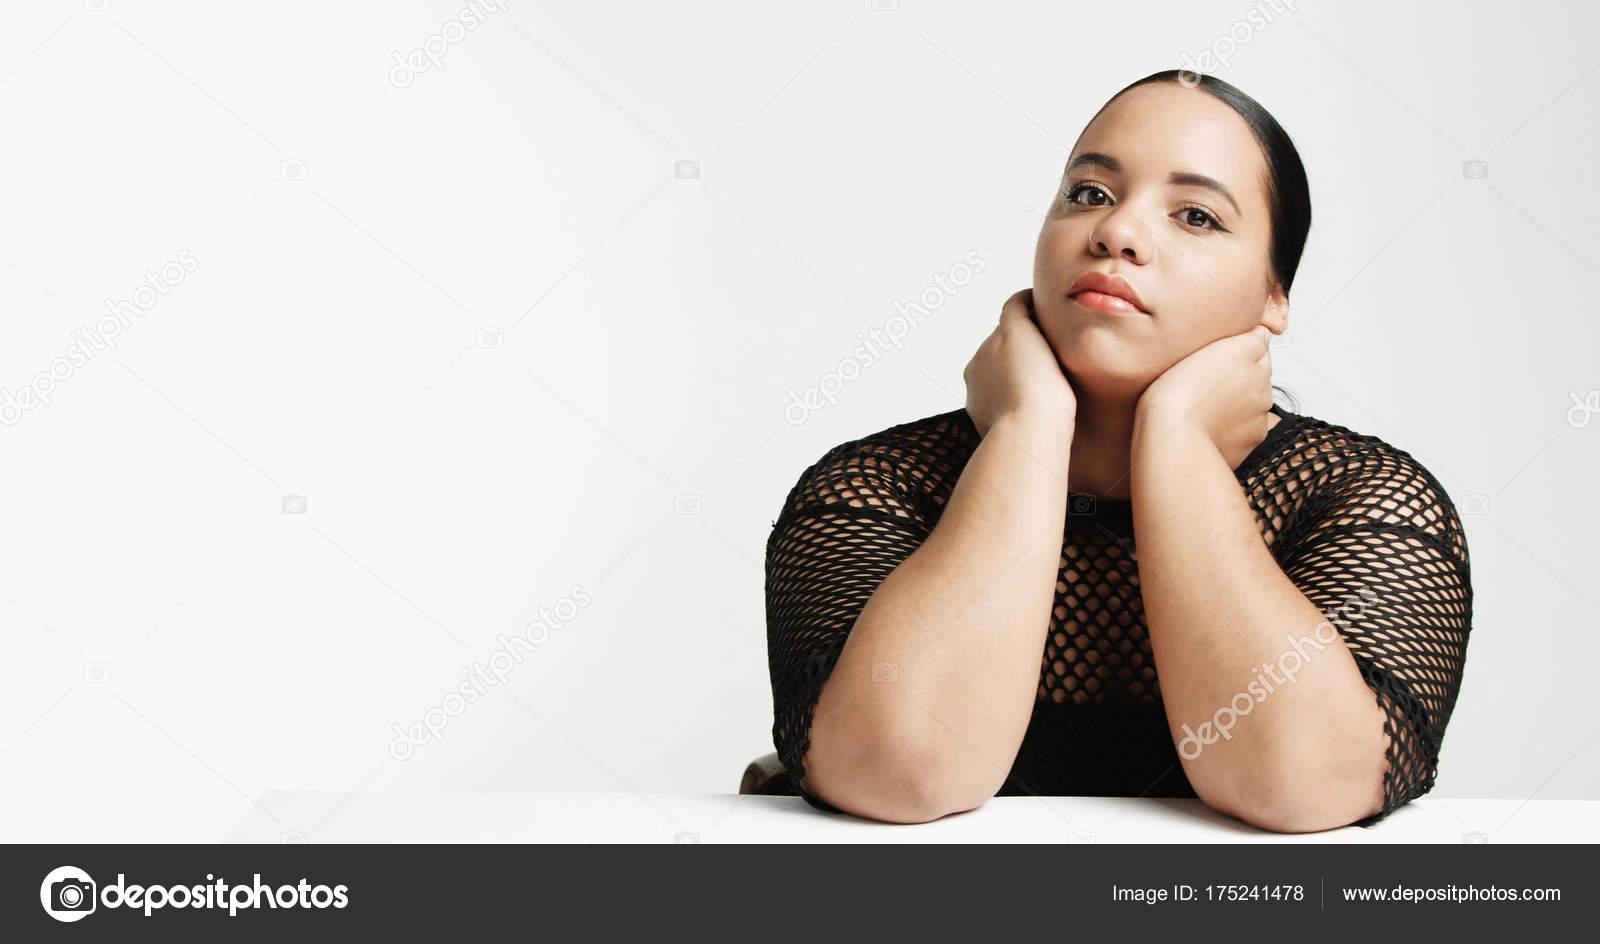 lesbiennes likken pussy pics